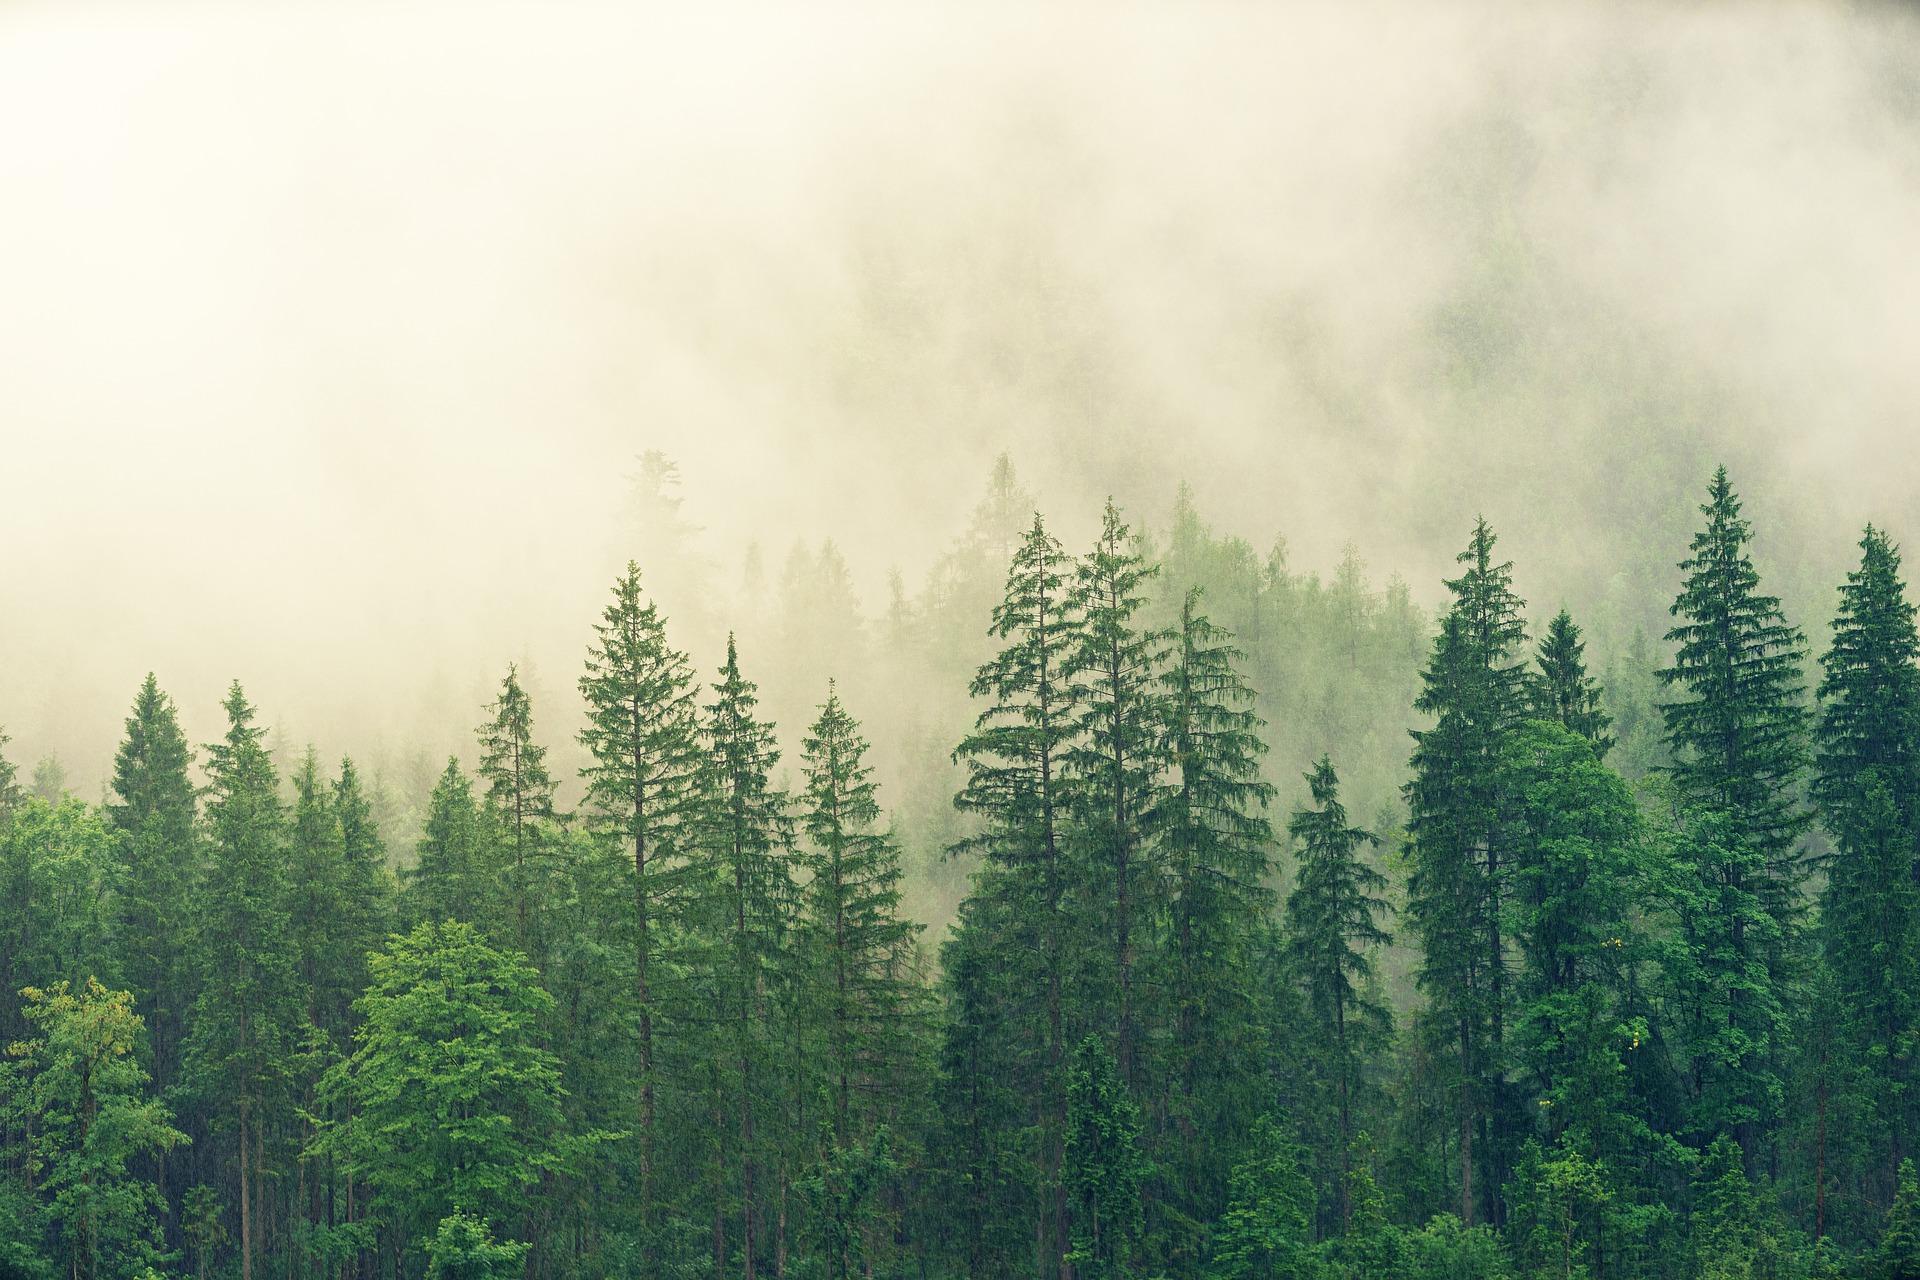 fog-3622519_1920_1560533408750.jpg